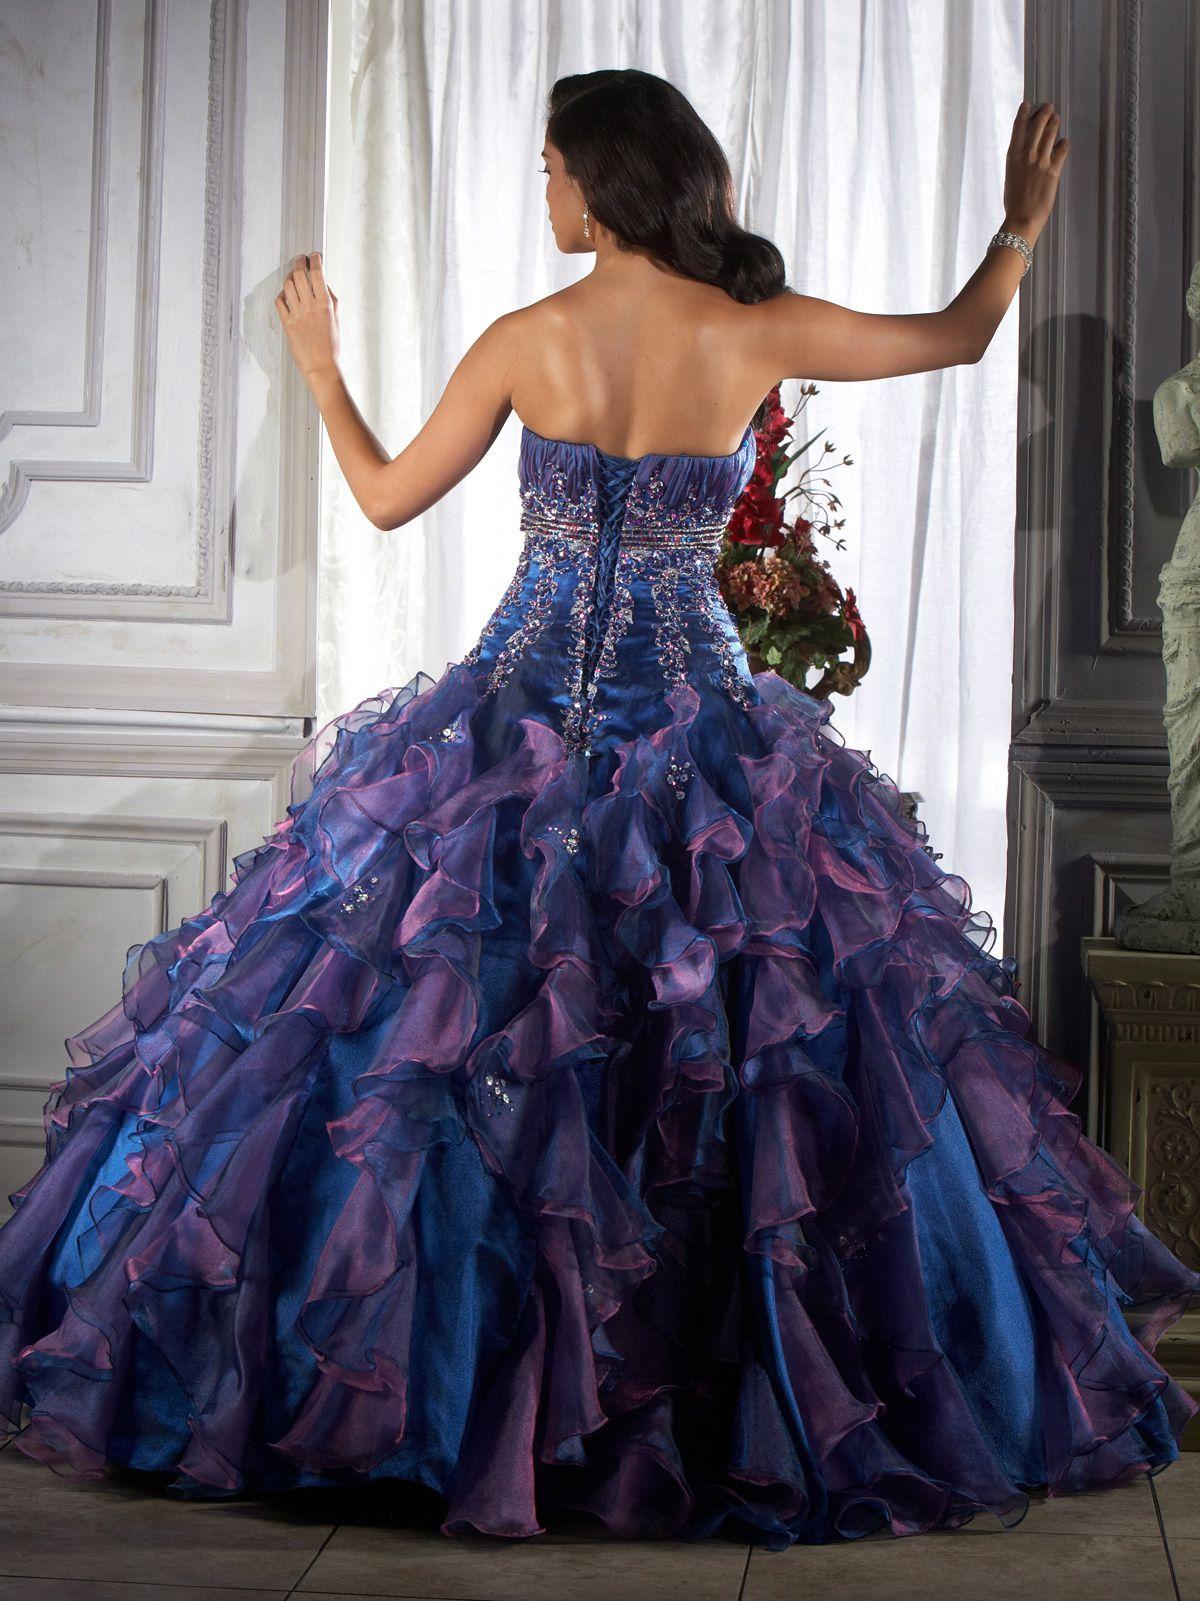 black+and+purple+wedding+dresses plus size wedding